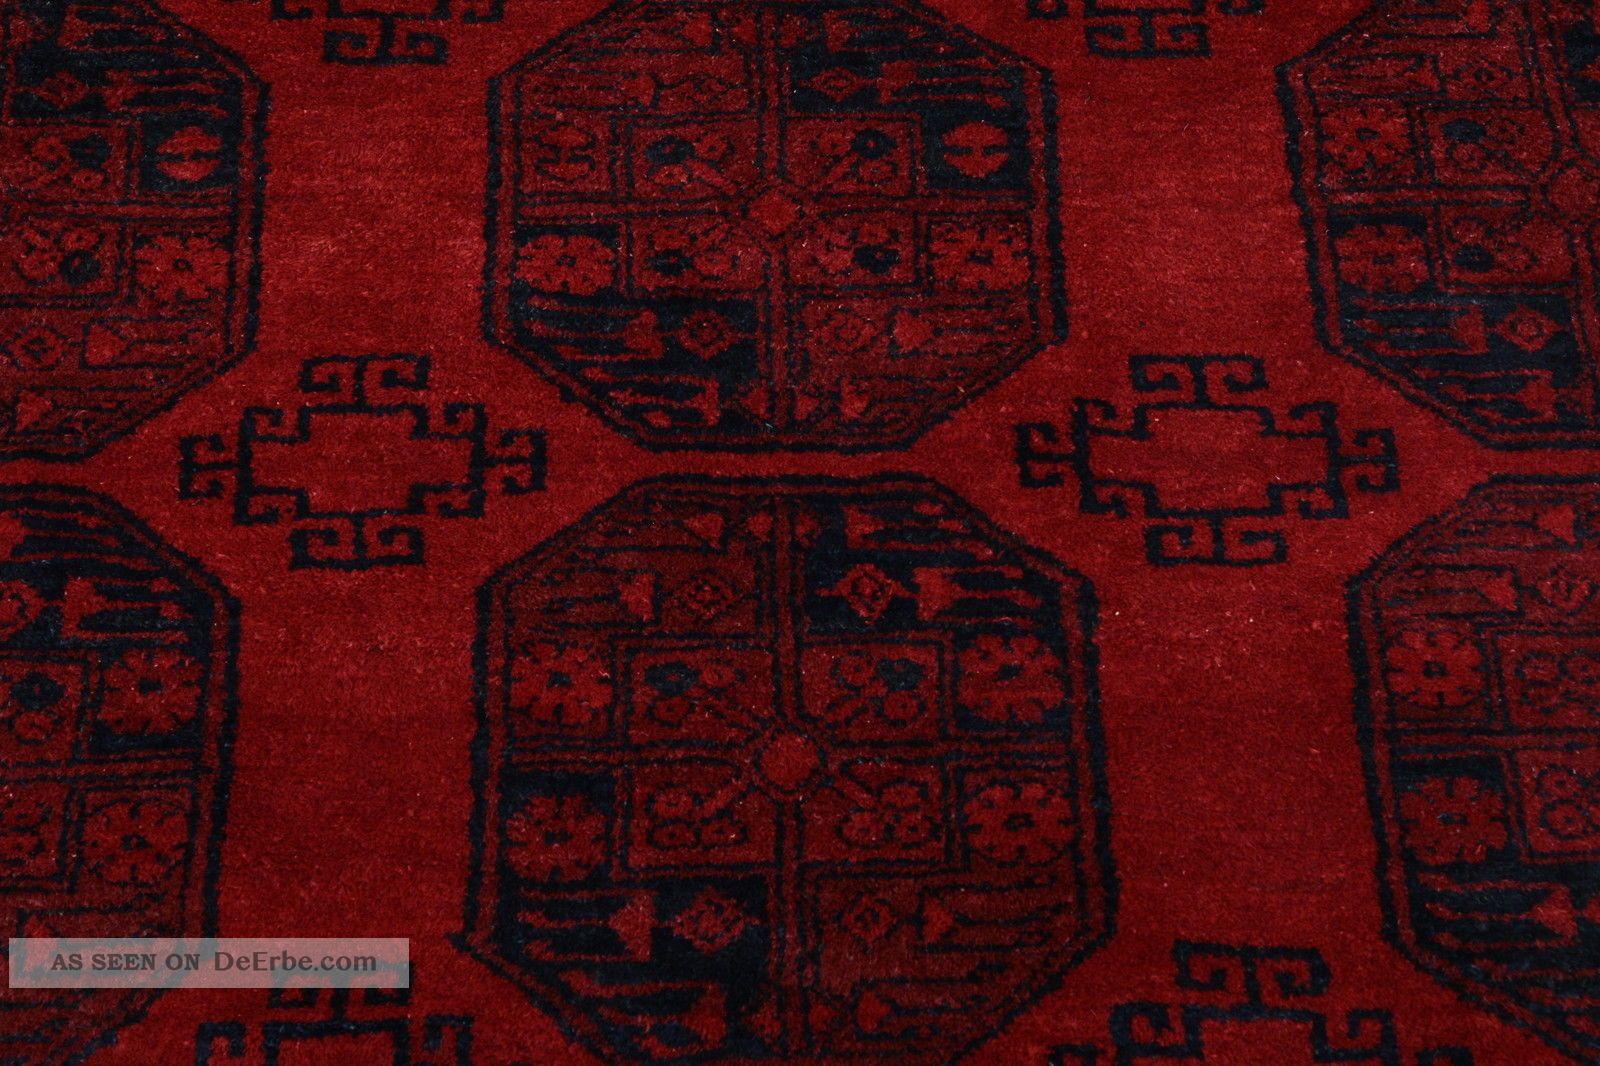 afghanischer teppich ca 350 x 246 cm gereinigt. Black Bedroom Furniture Sets. Home Design Ideas